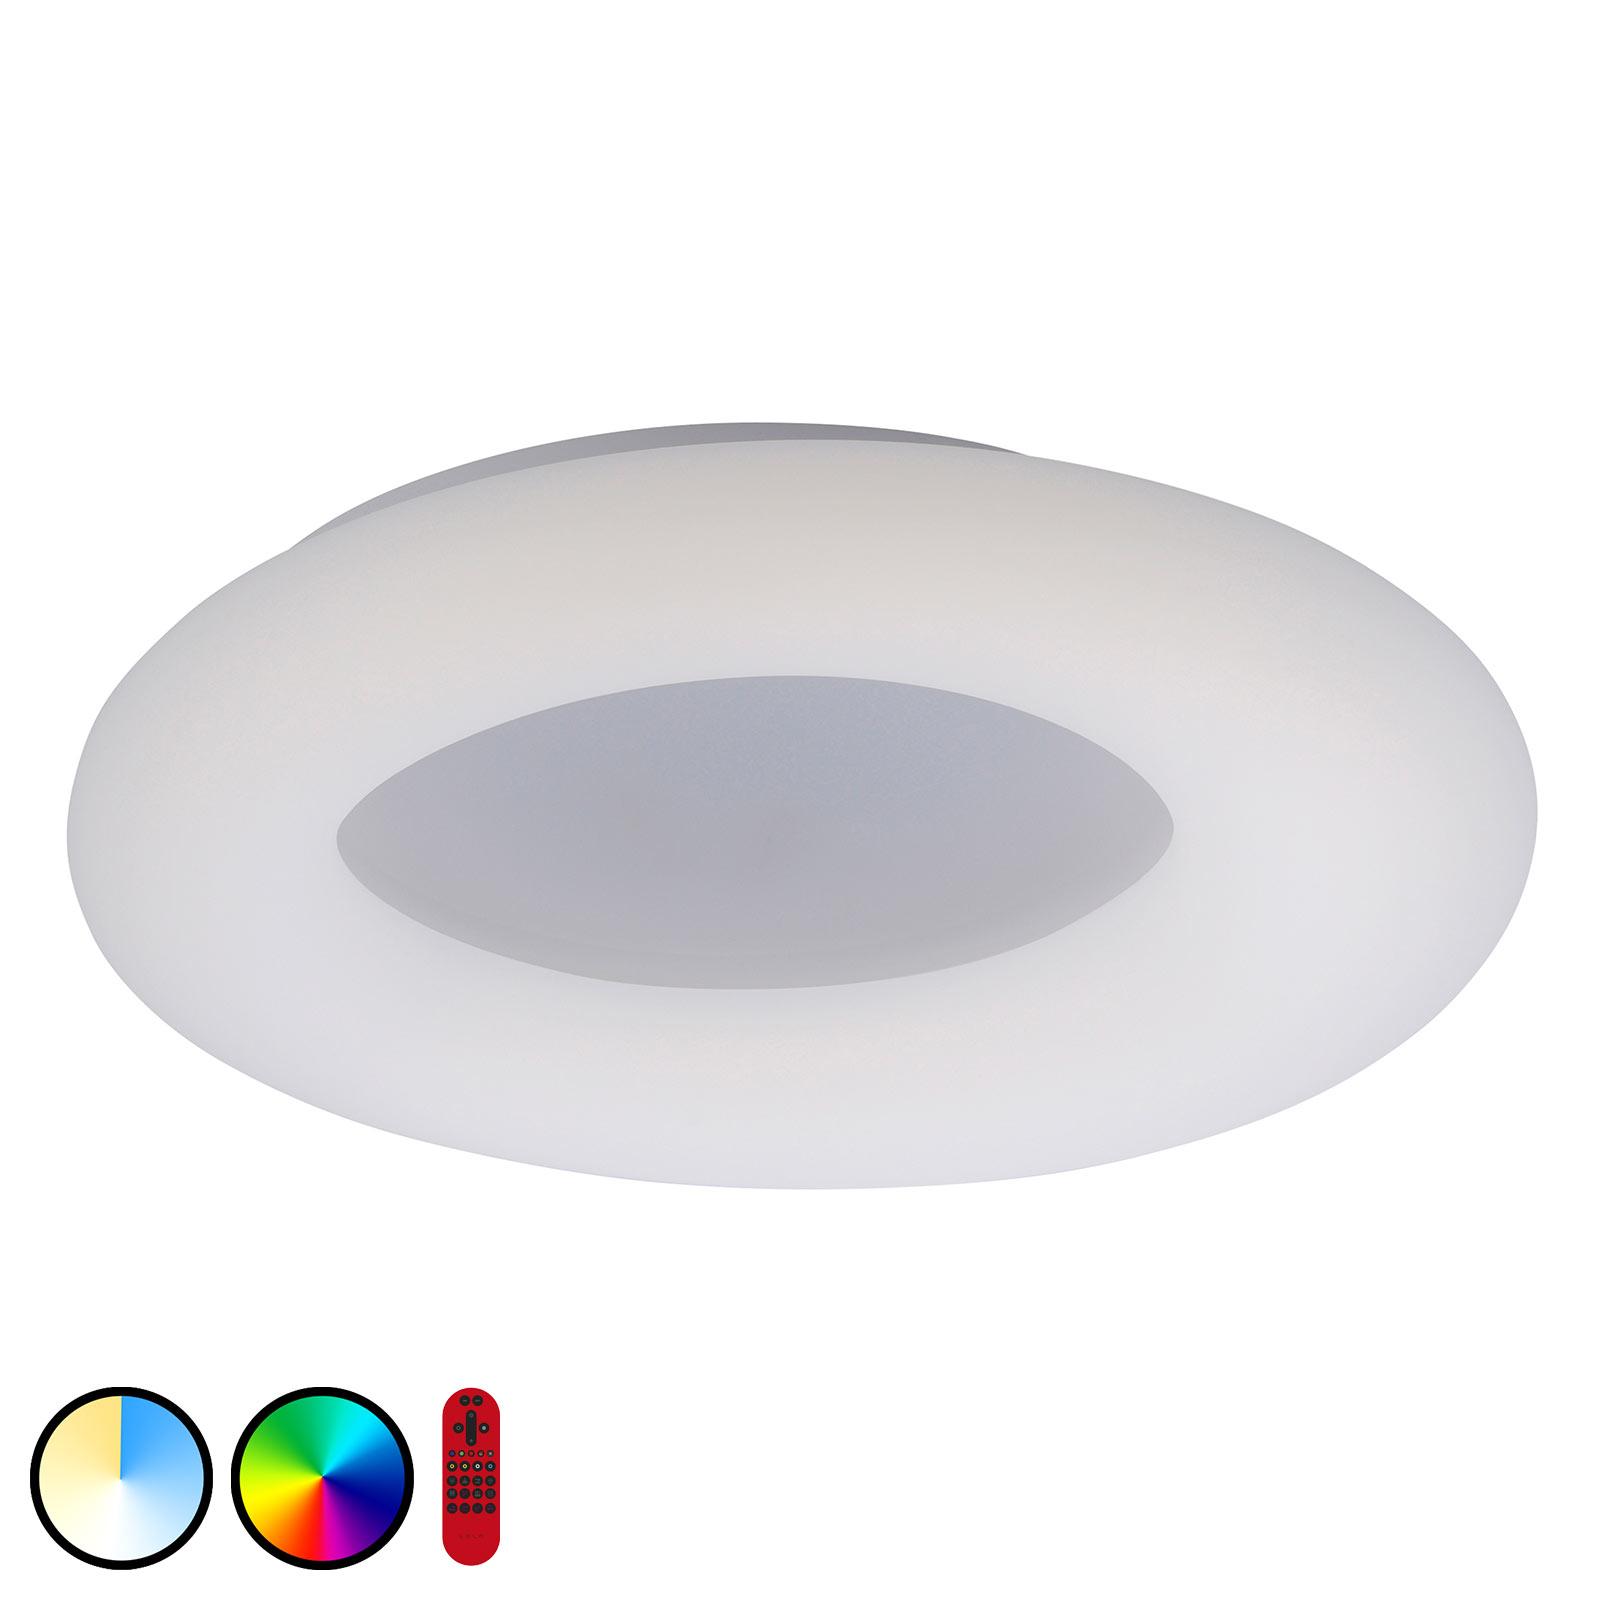 LED-Deckenleuchte LOLAsmart Donut, Ø 60 cm